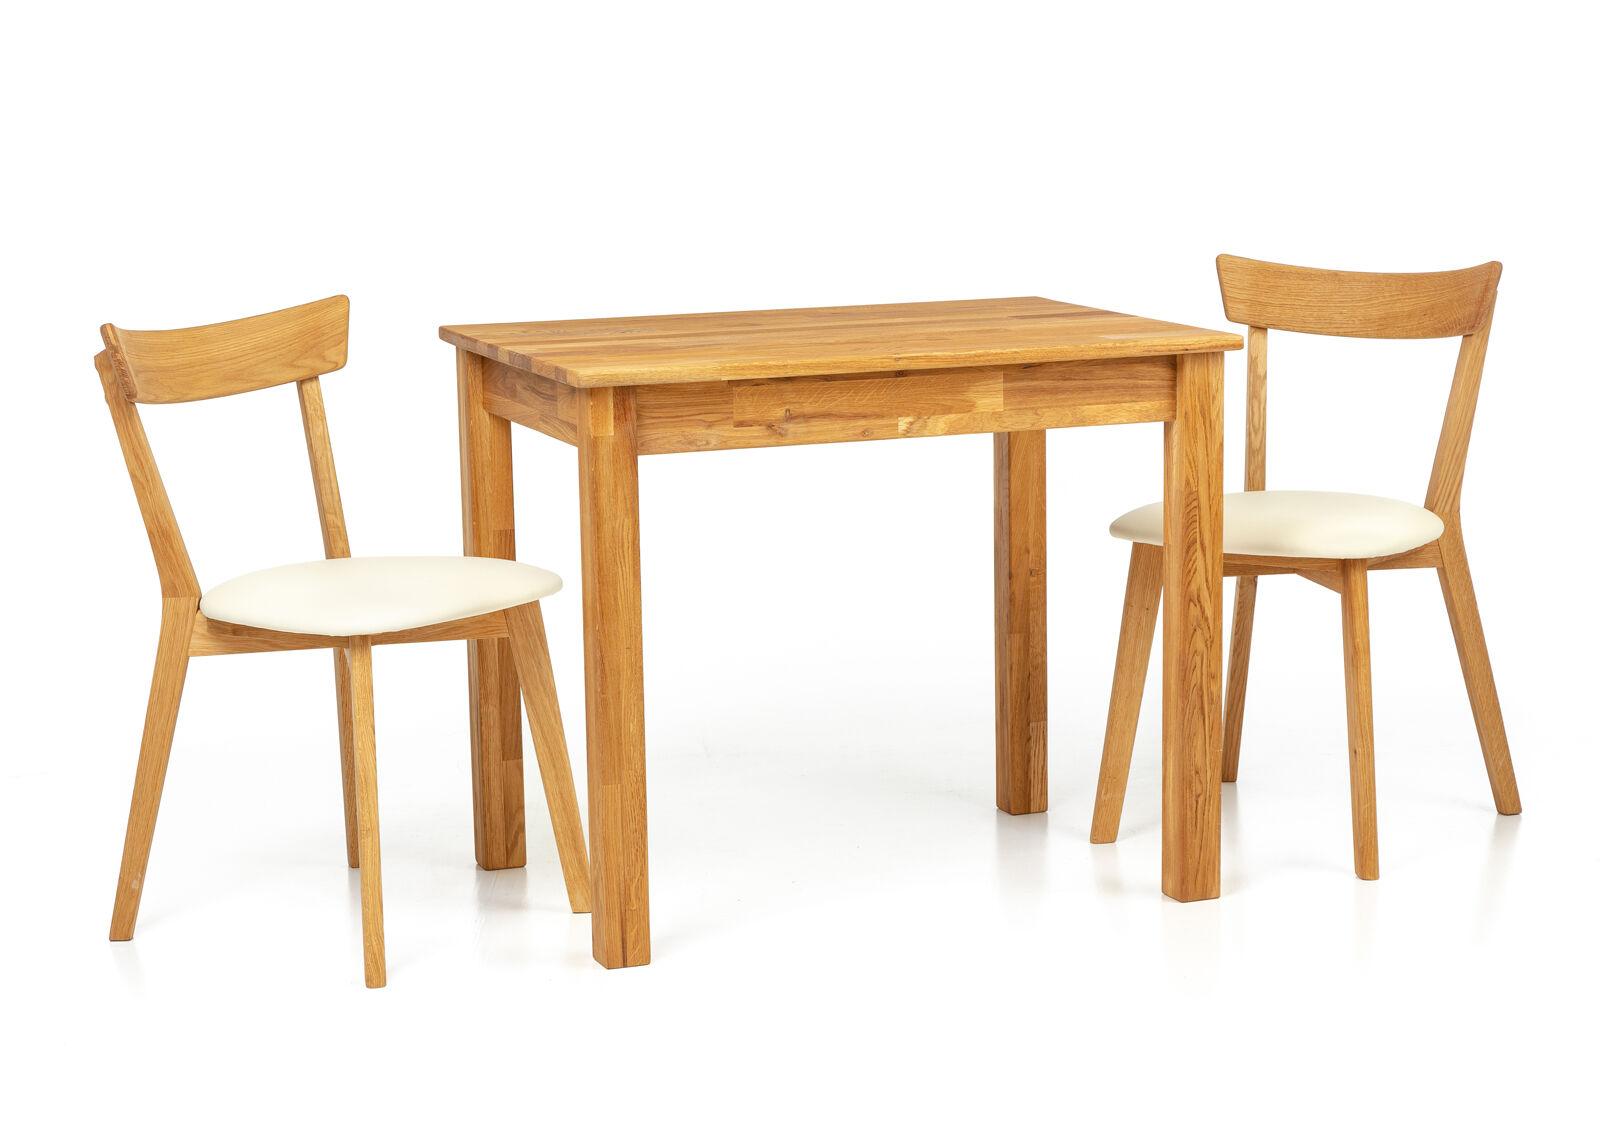 Lem Tammi ruokapöytä Len23 90x65 cm + 2 tuolia Viola beige